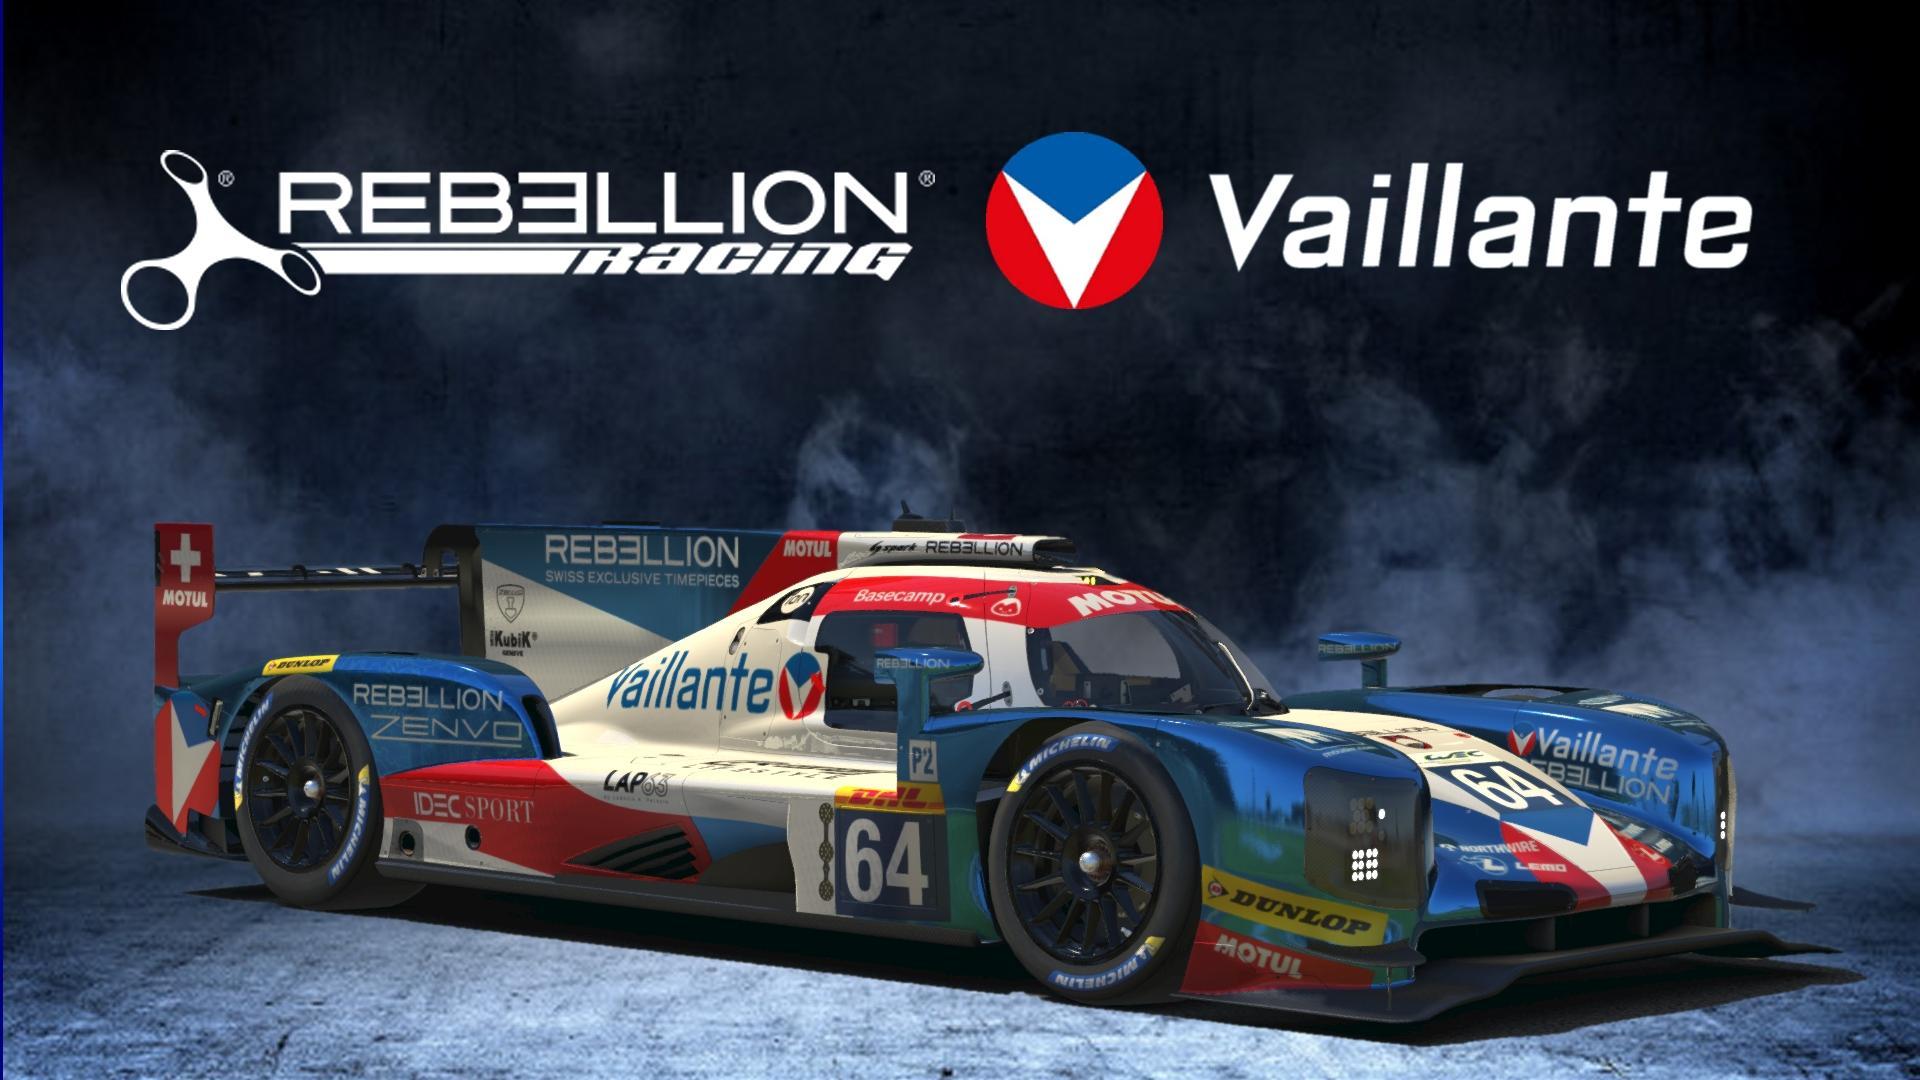 Preview of Dallara P217 Vaillante by Don Craig